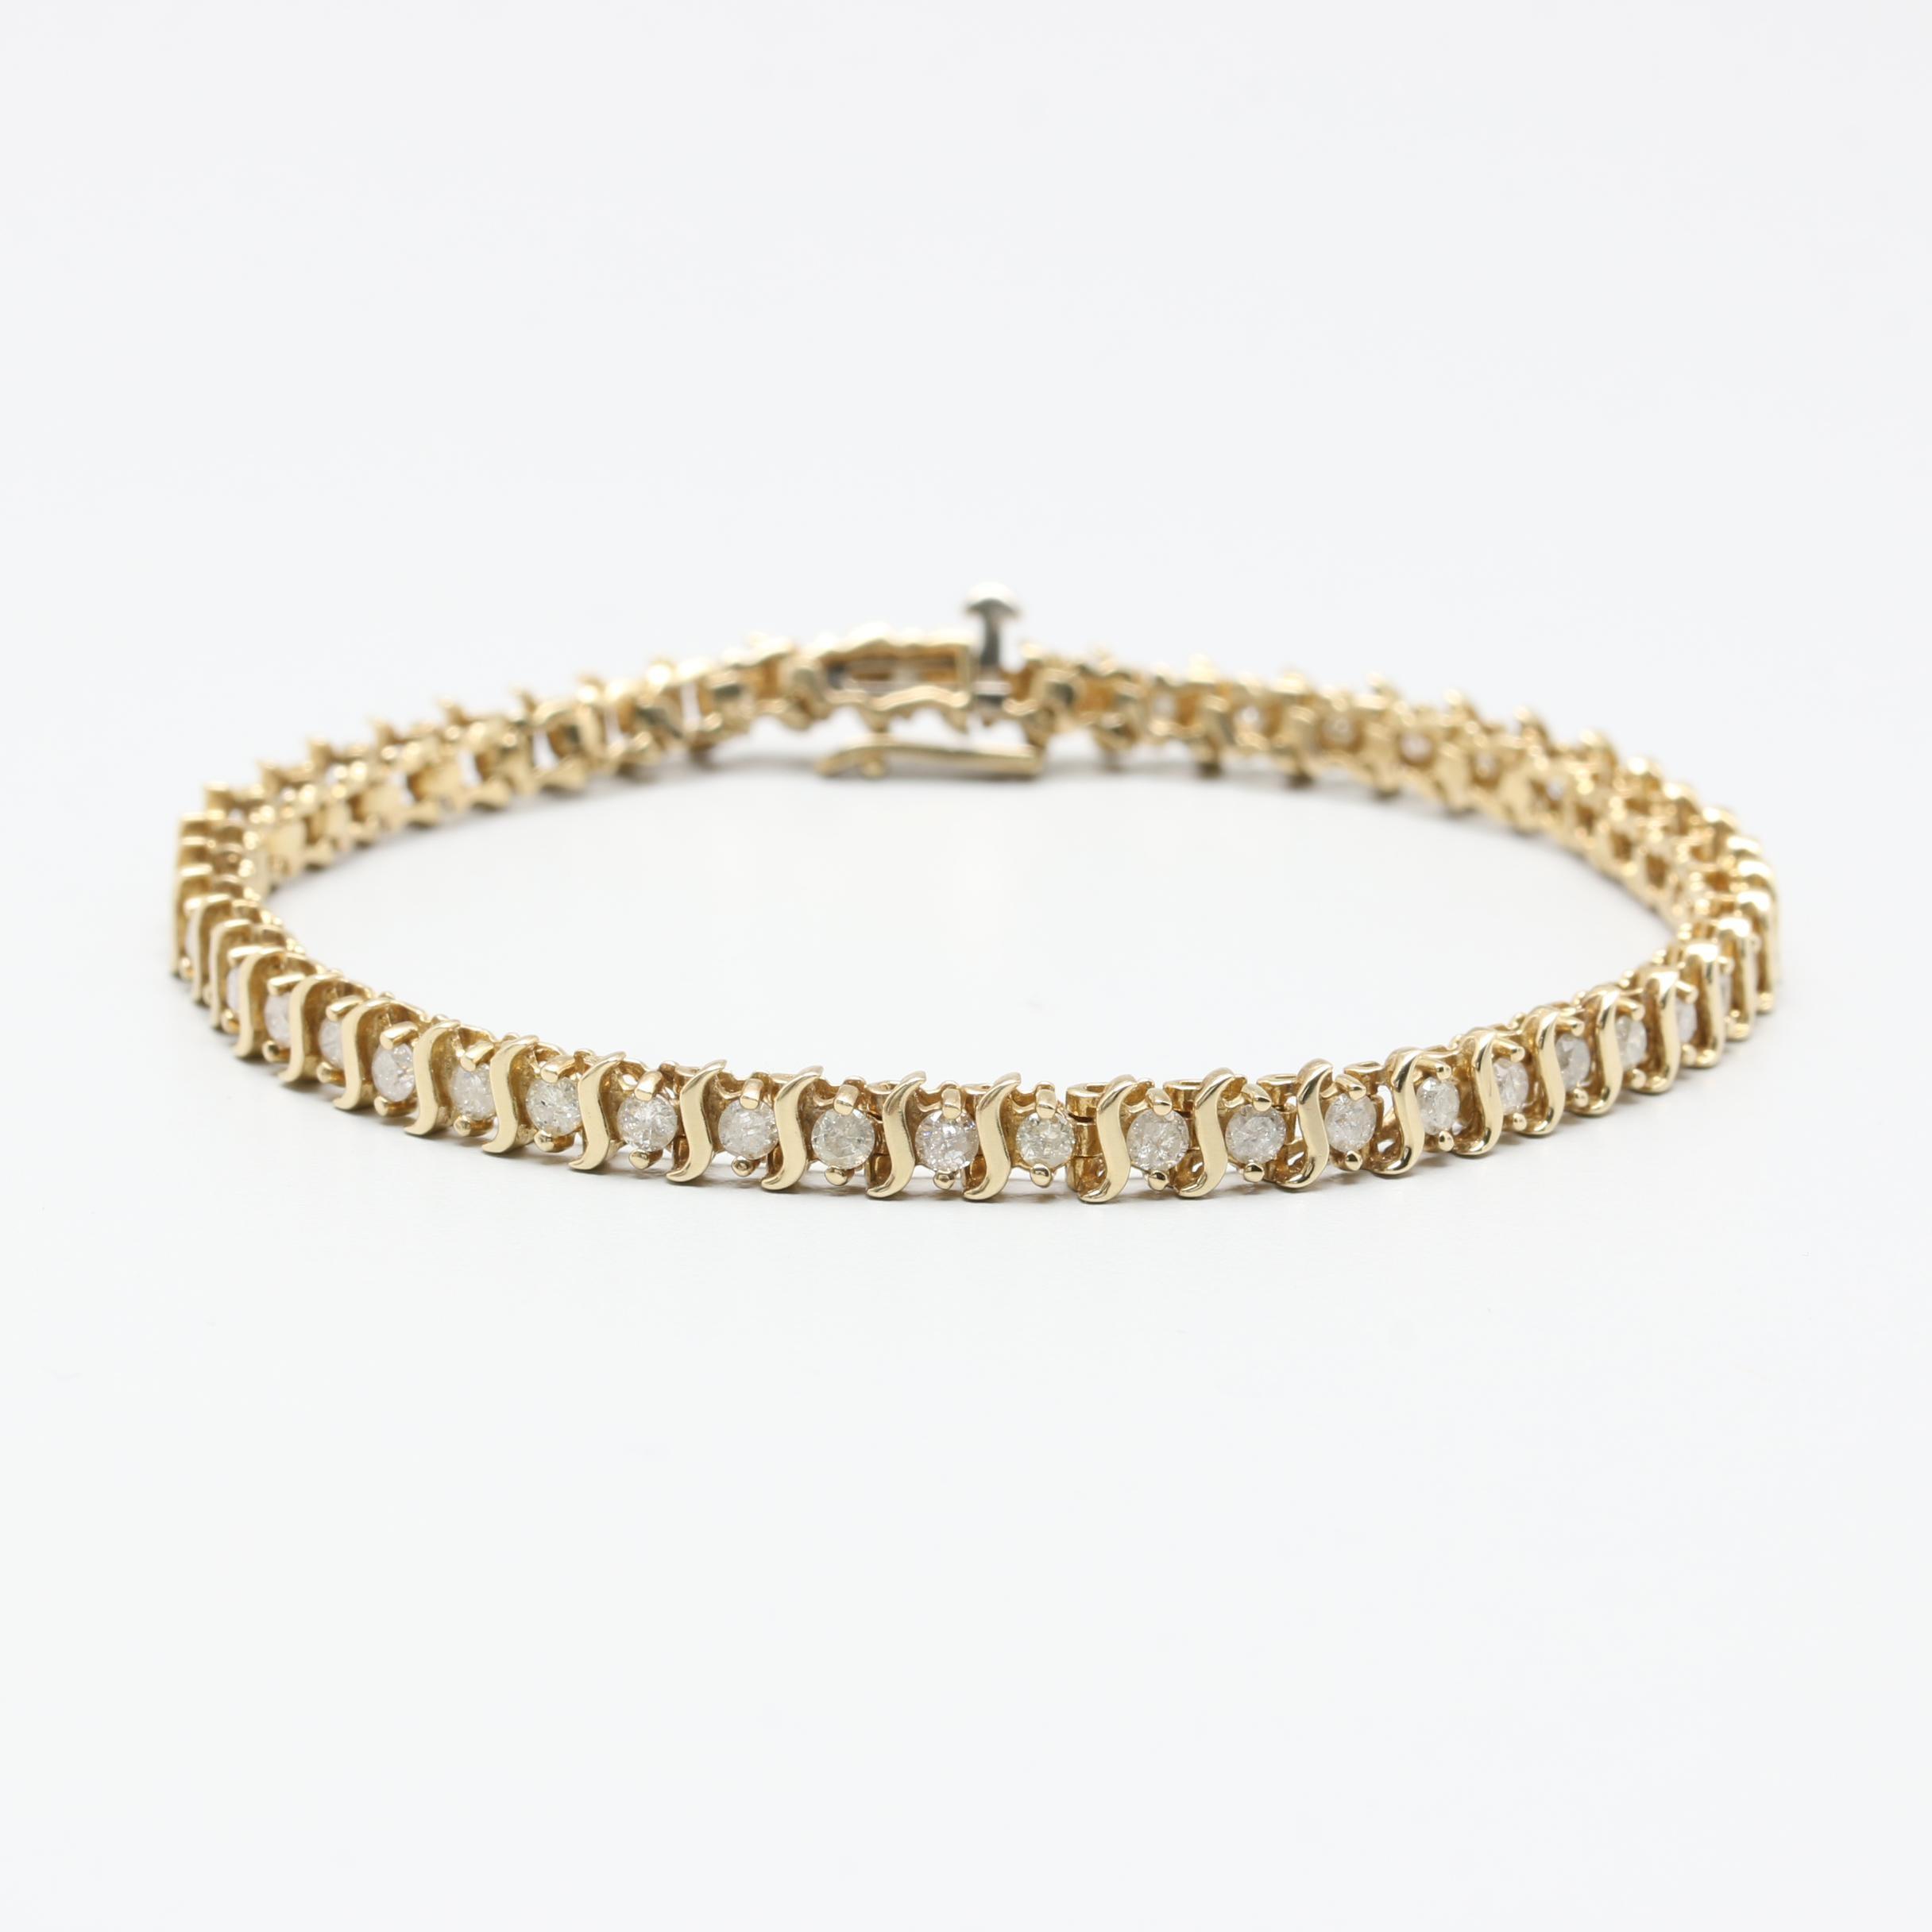 10K Yellow Gold 2.12 CTW Diamond Link Bracelet